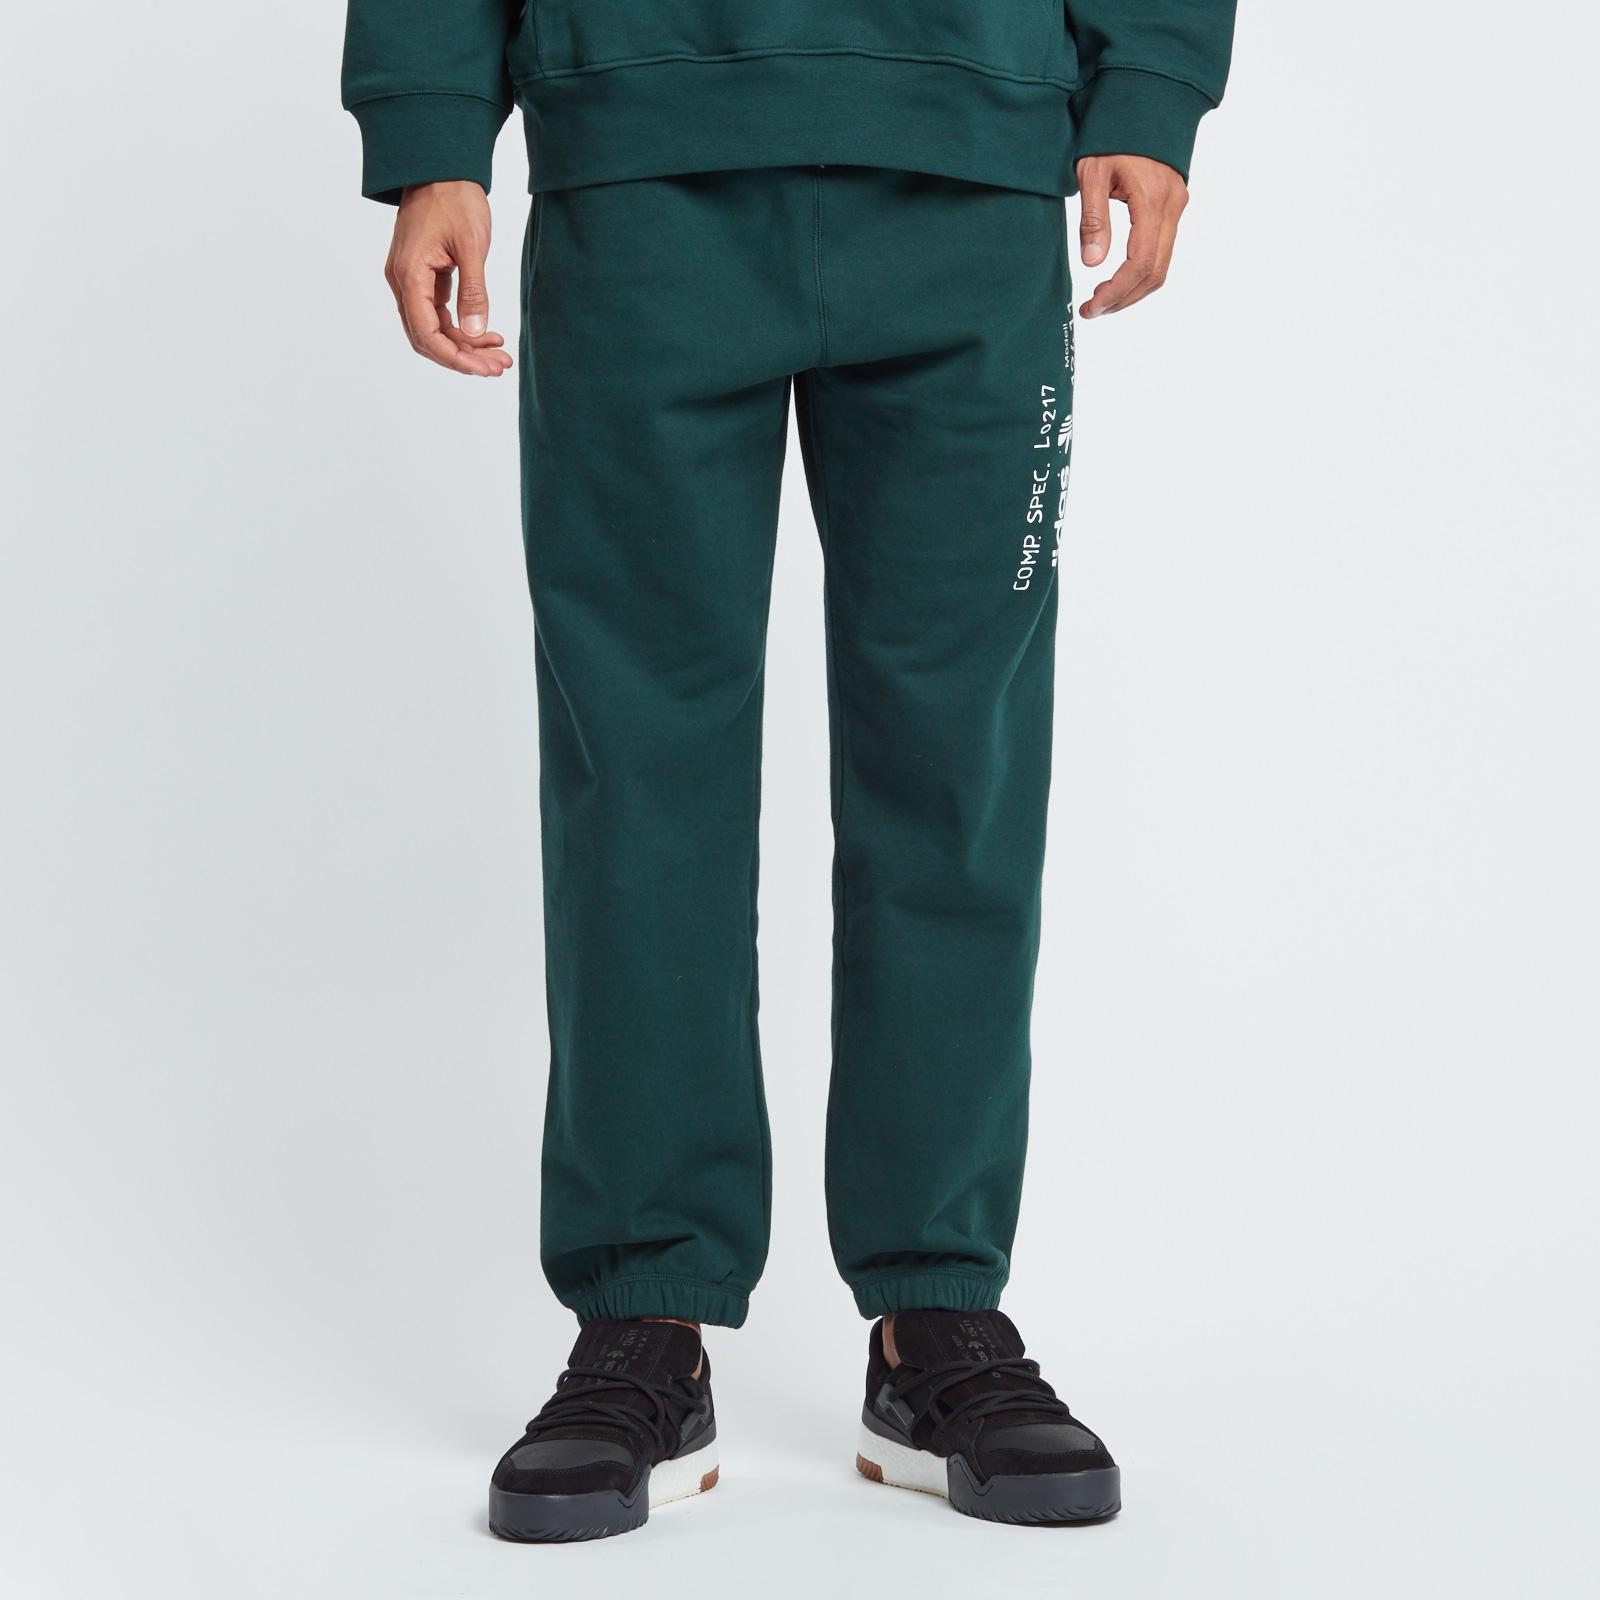 e55cd7359a09 adidas Graphic Sweatpants - Cv5295 - Sneakersnstuff